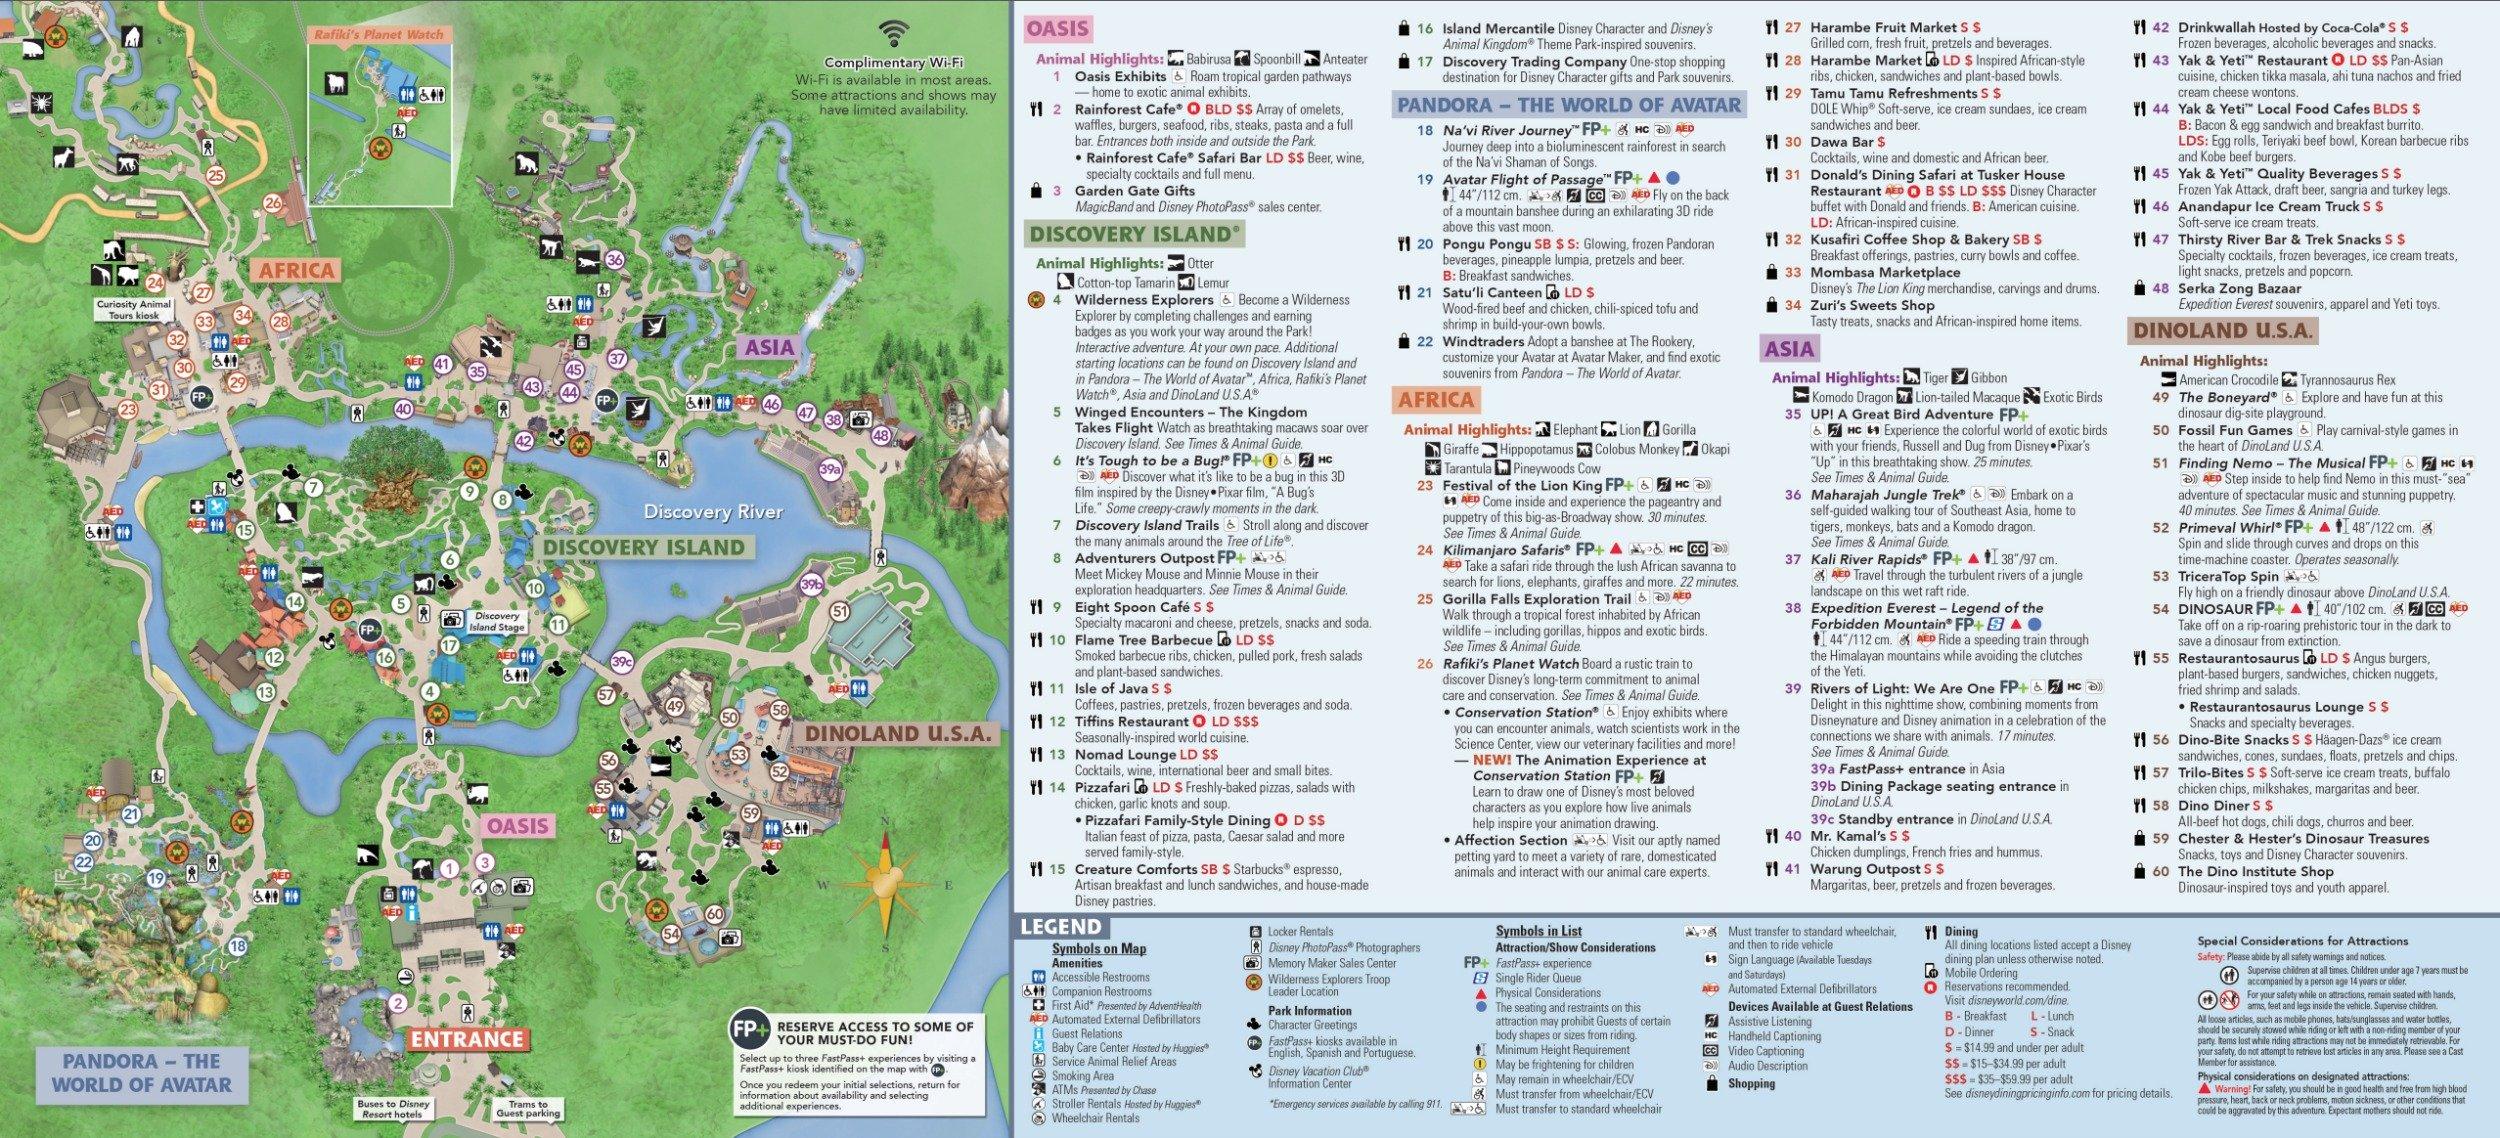 2020 Animal Kingdom Map